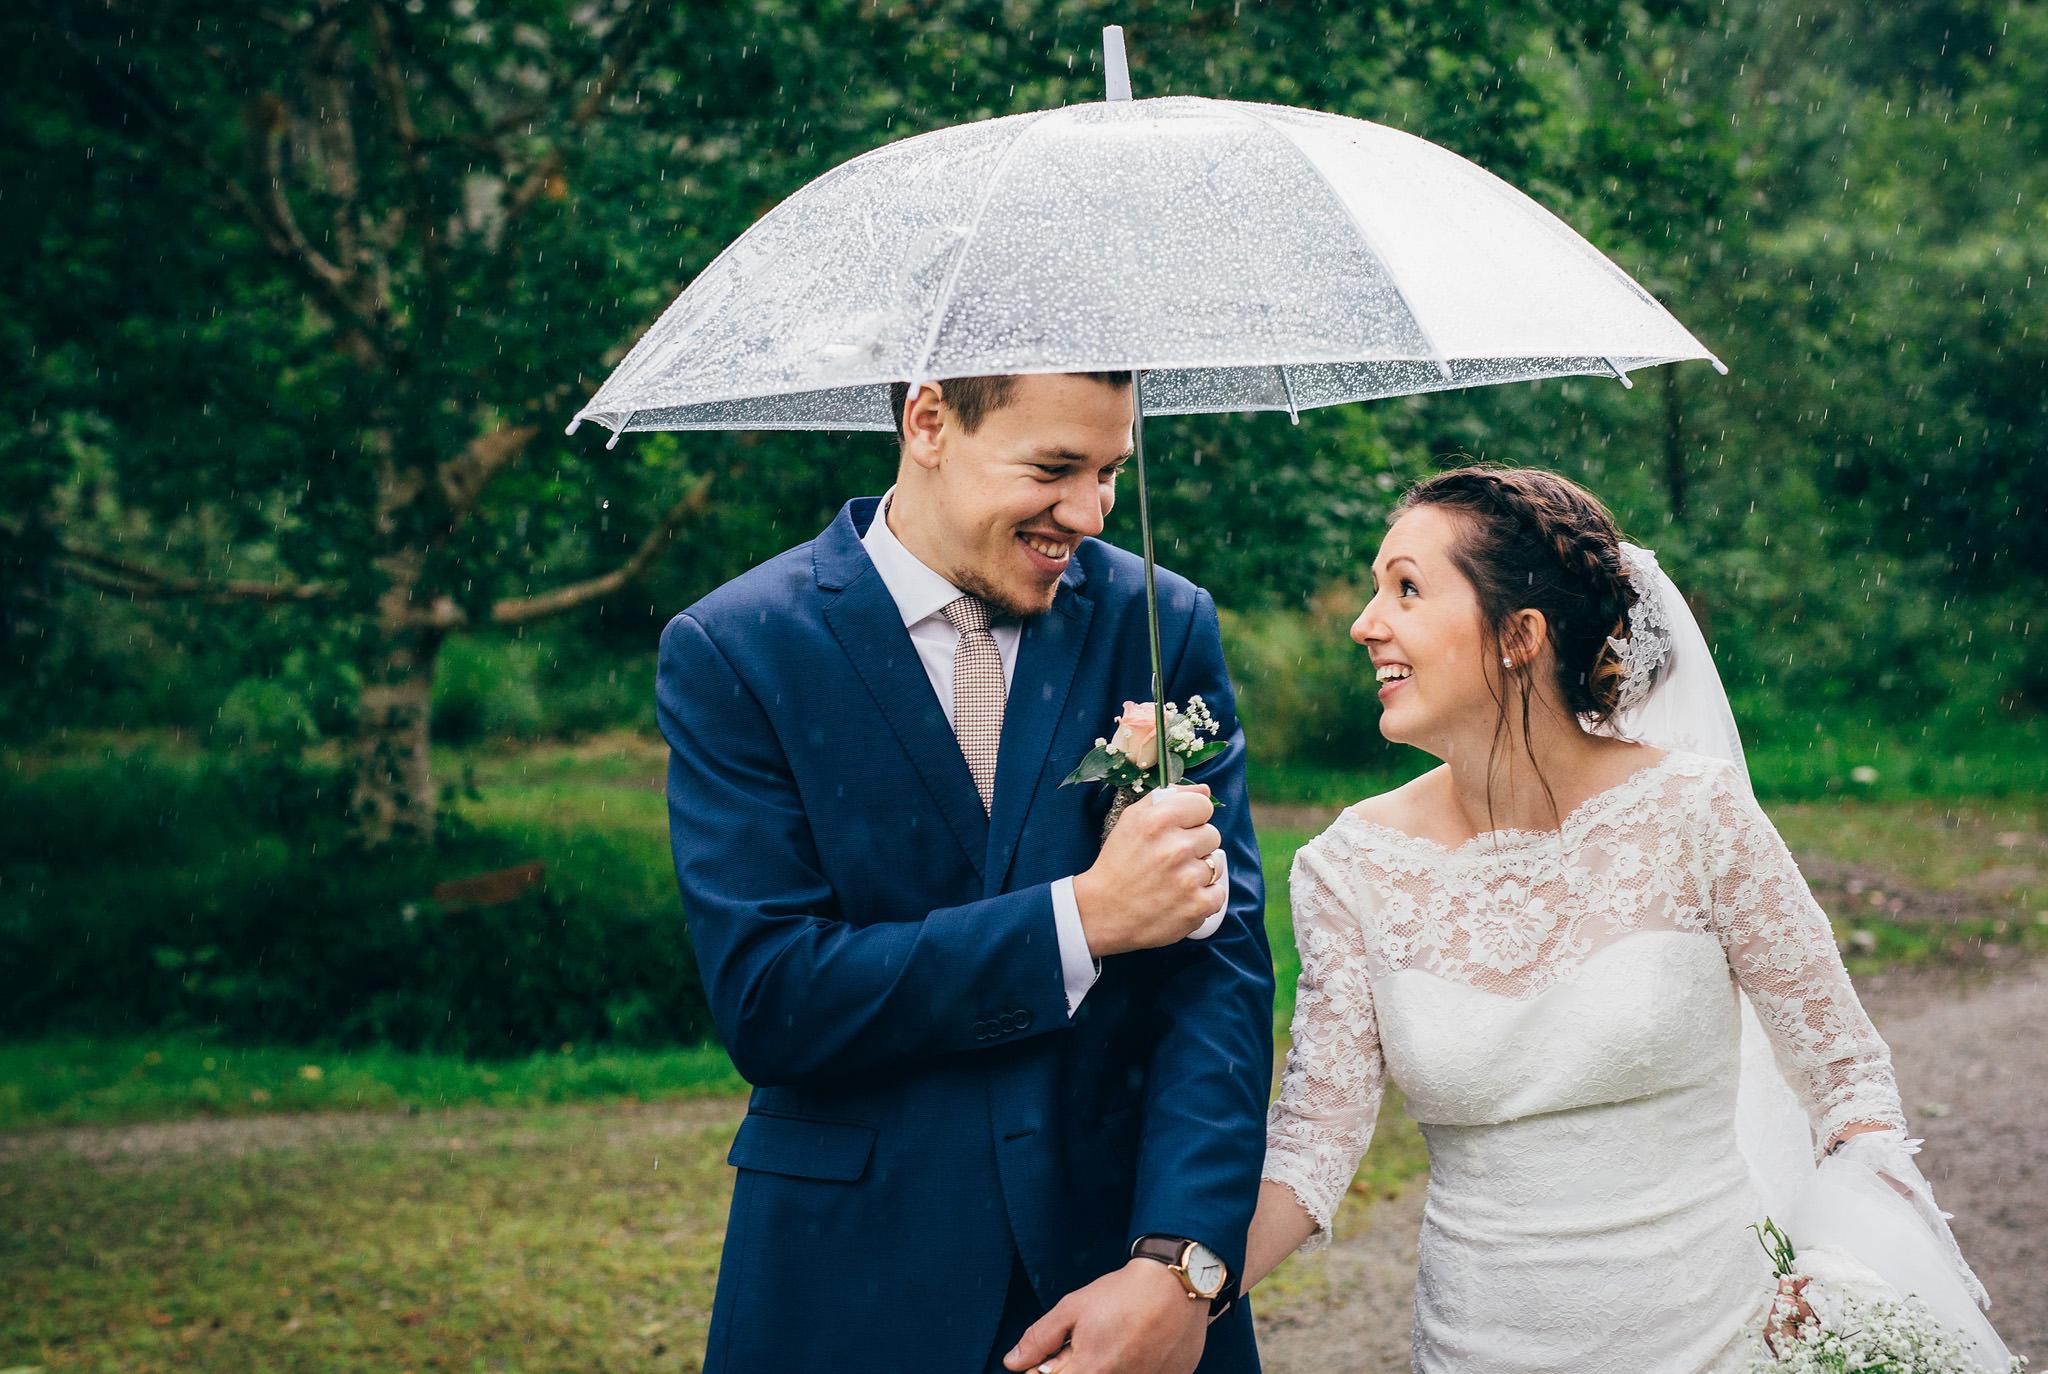 Norway+wedding+photographer+elopement+pre+wedding+Casey+Arneson-67.jpg